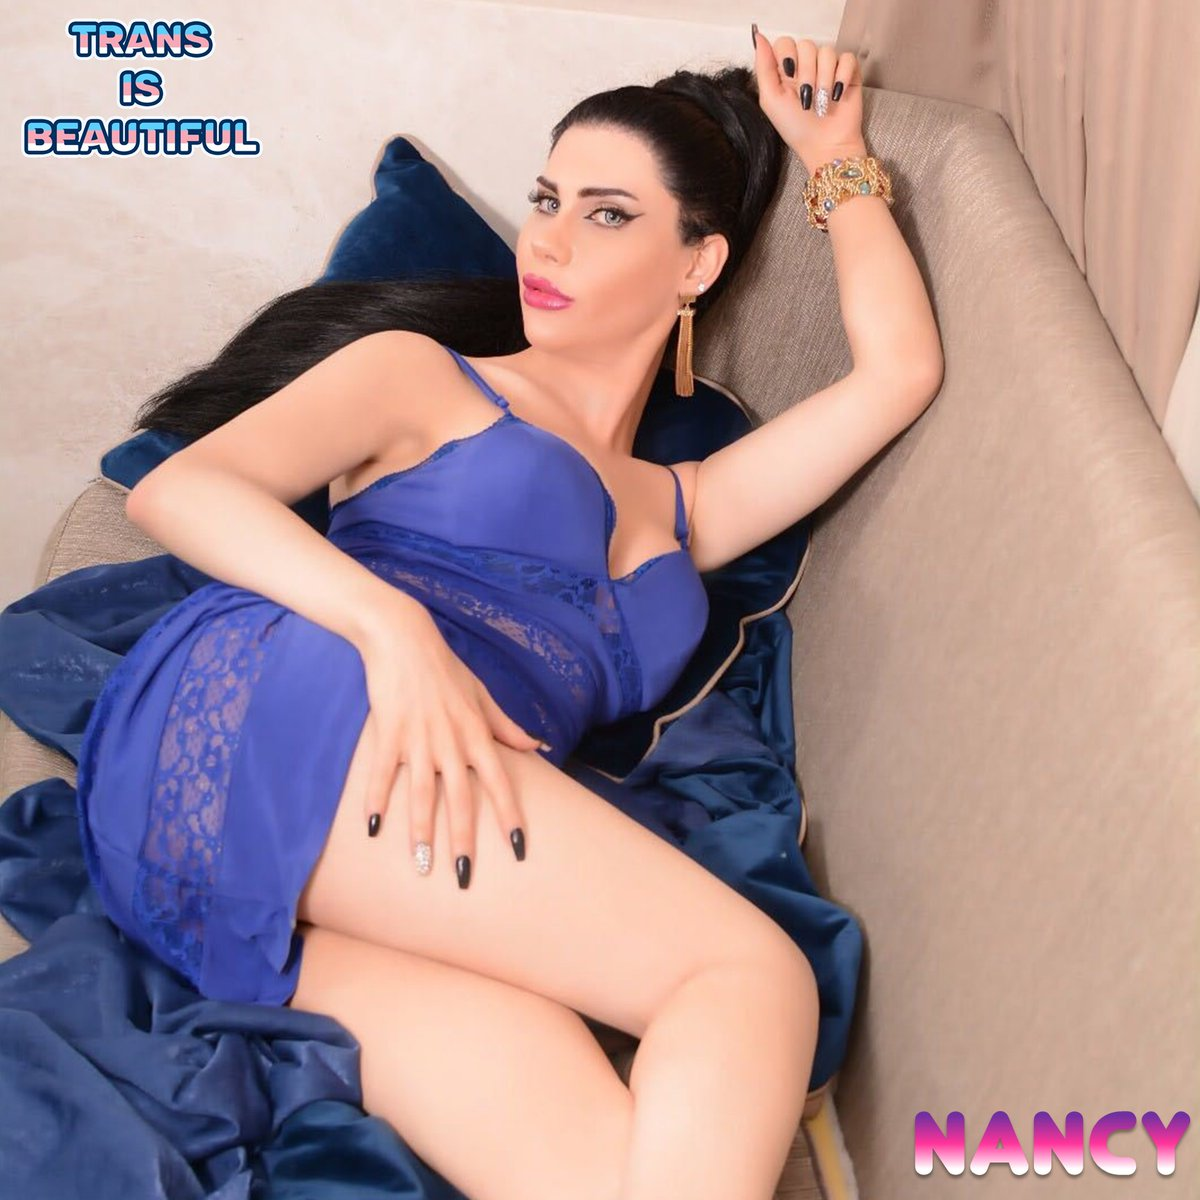 #TransIsBeautiful 🦋 A Hot & Beautiful Moroccan #TransLady — Nancy 🧜♀️ #transsingle #transwoman #femme #tsgirl #transproud #nancy